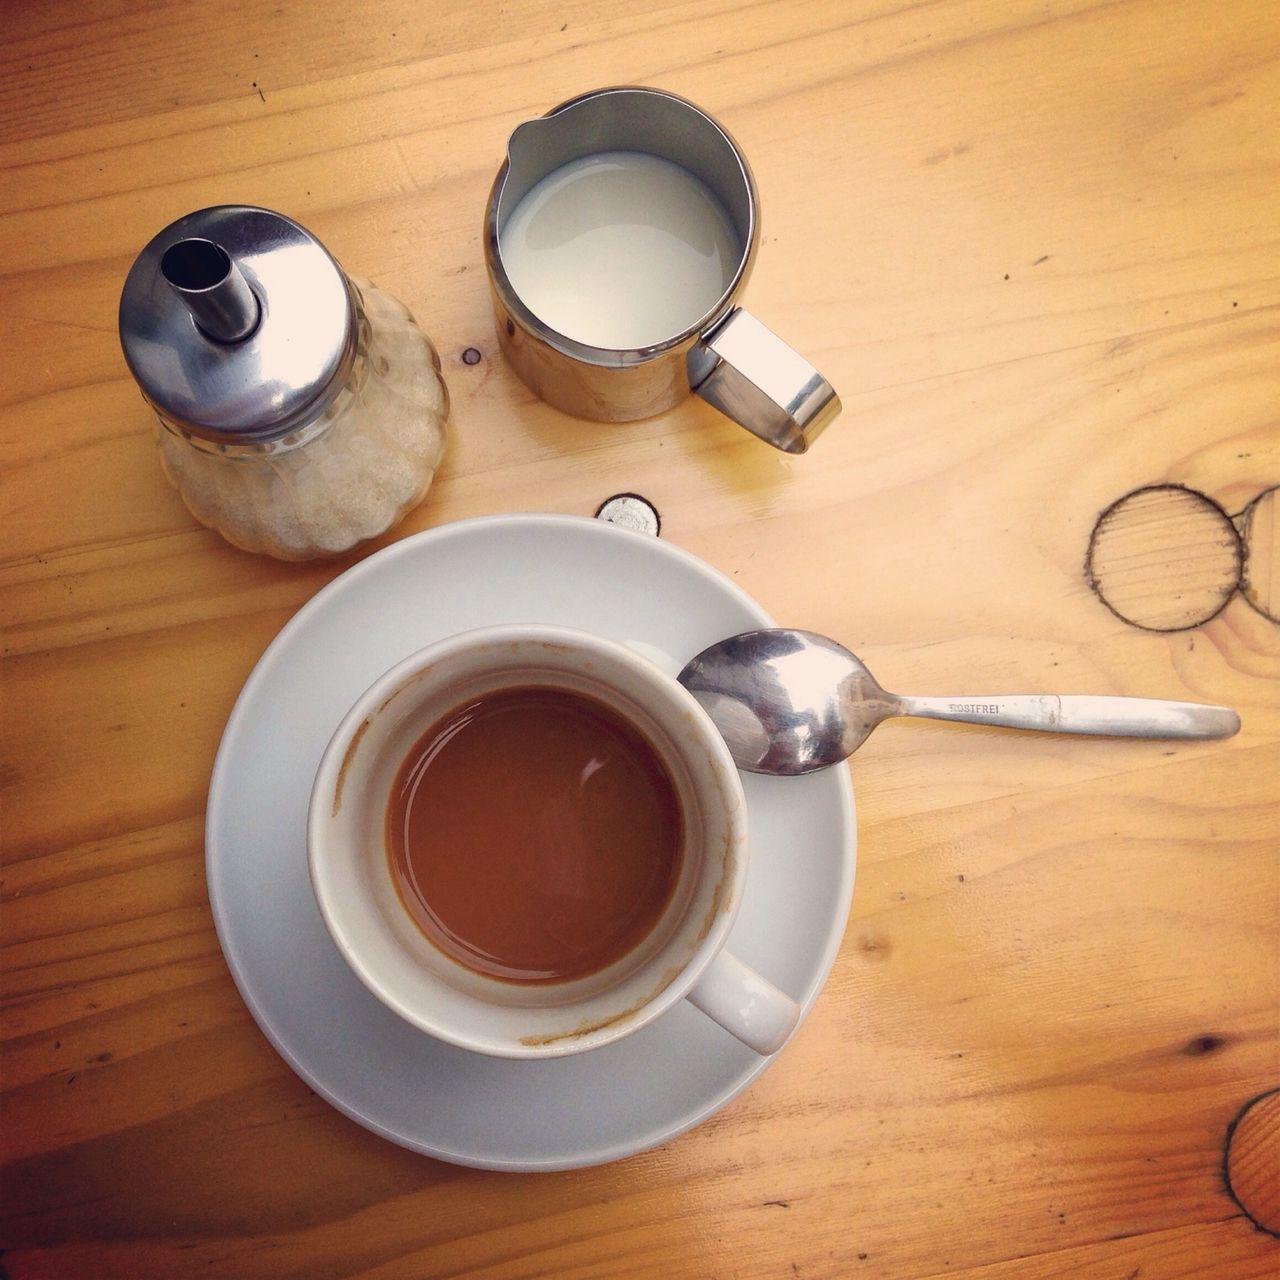 Summerinthecity Coffeeamericano Proviantberlin Stayawake